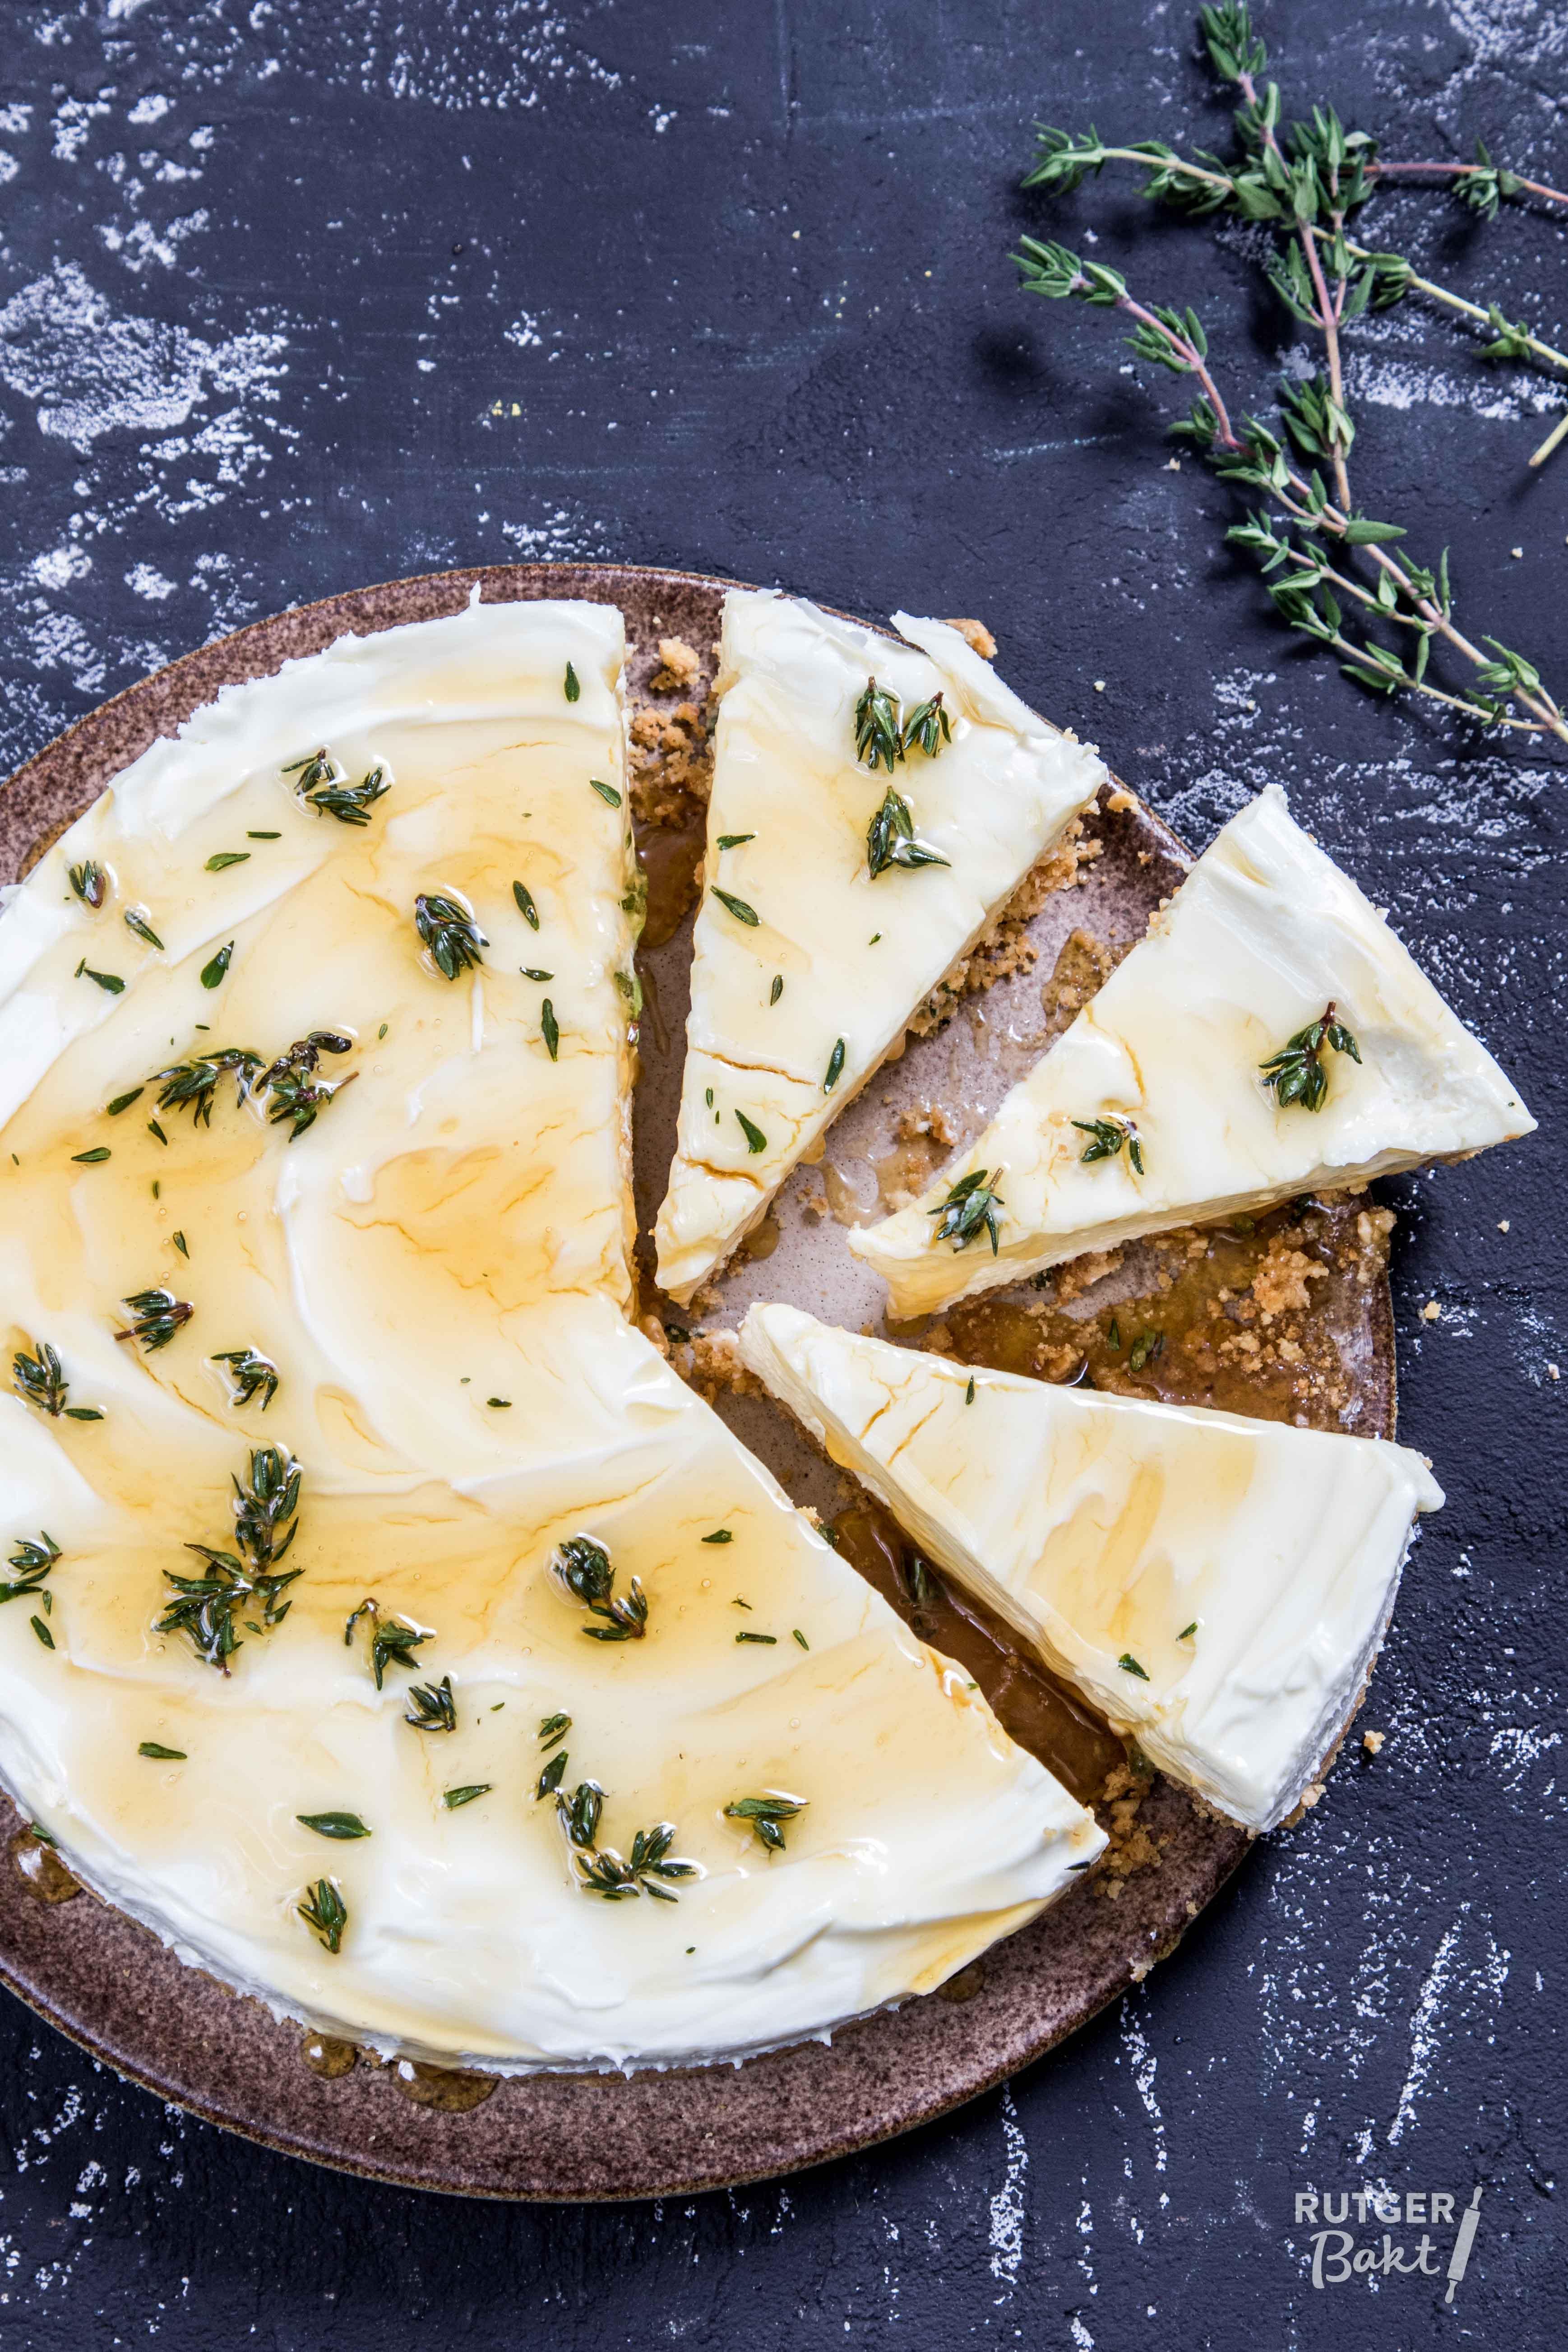 No Bake Cheesecake Van Ottolenghi Rutger Bakt